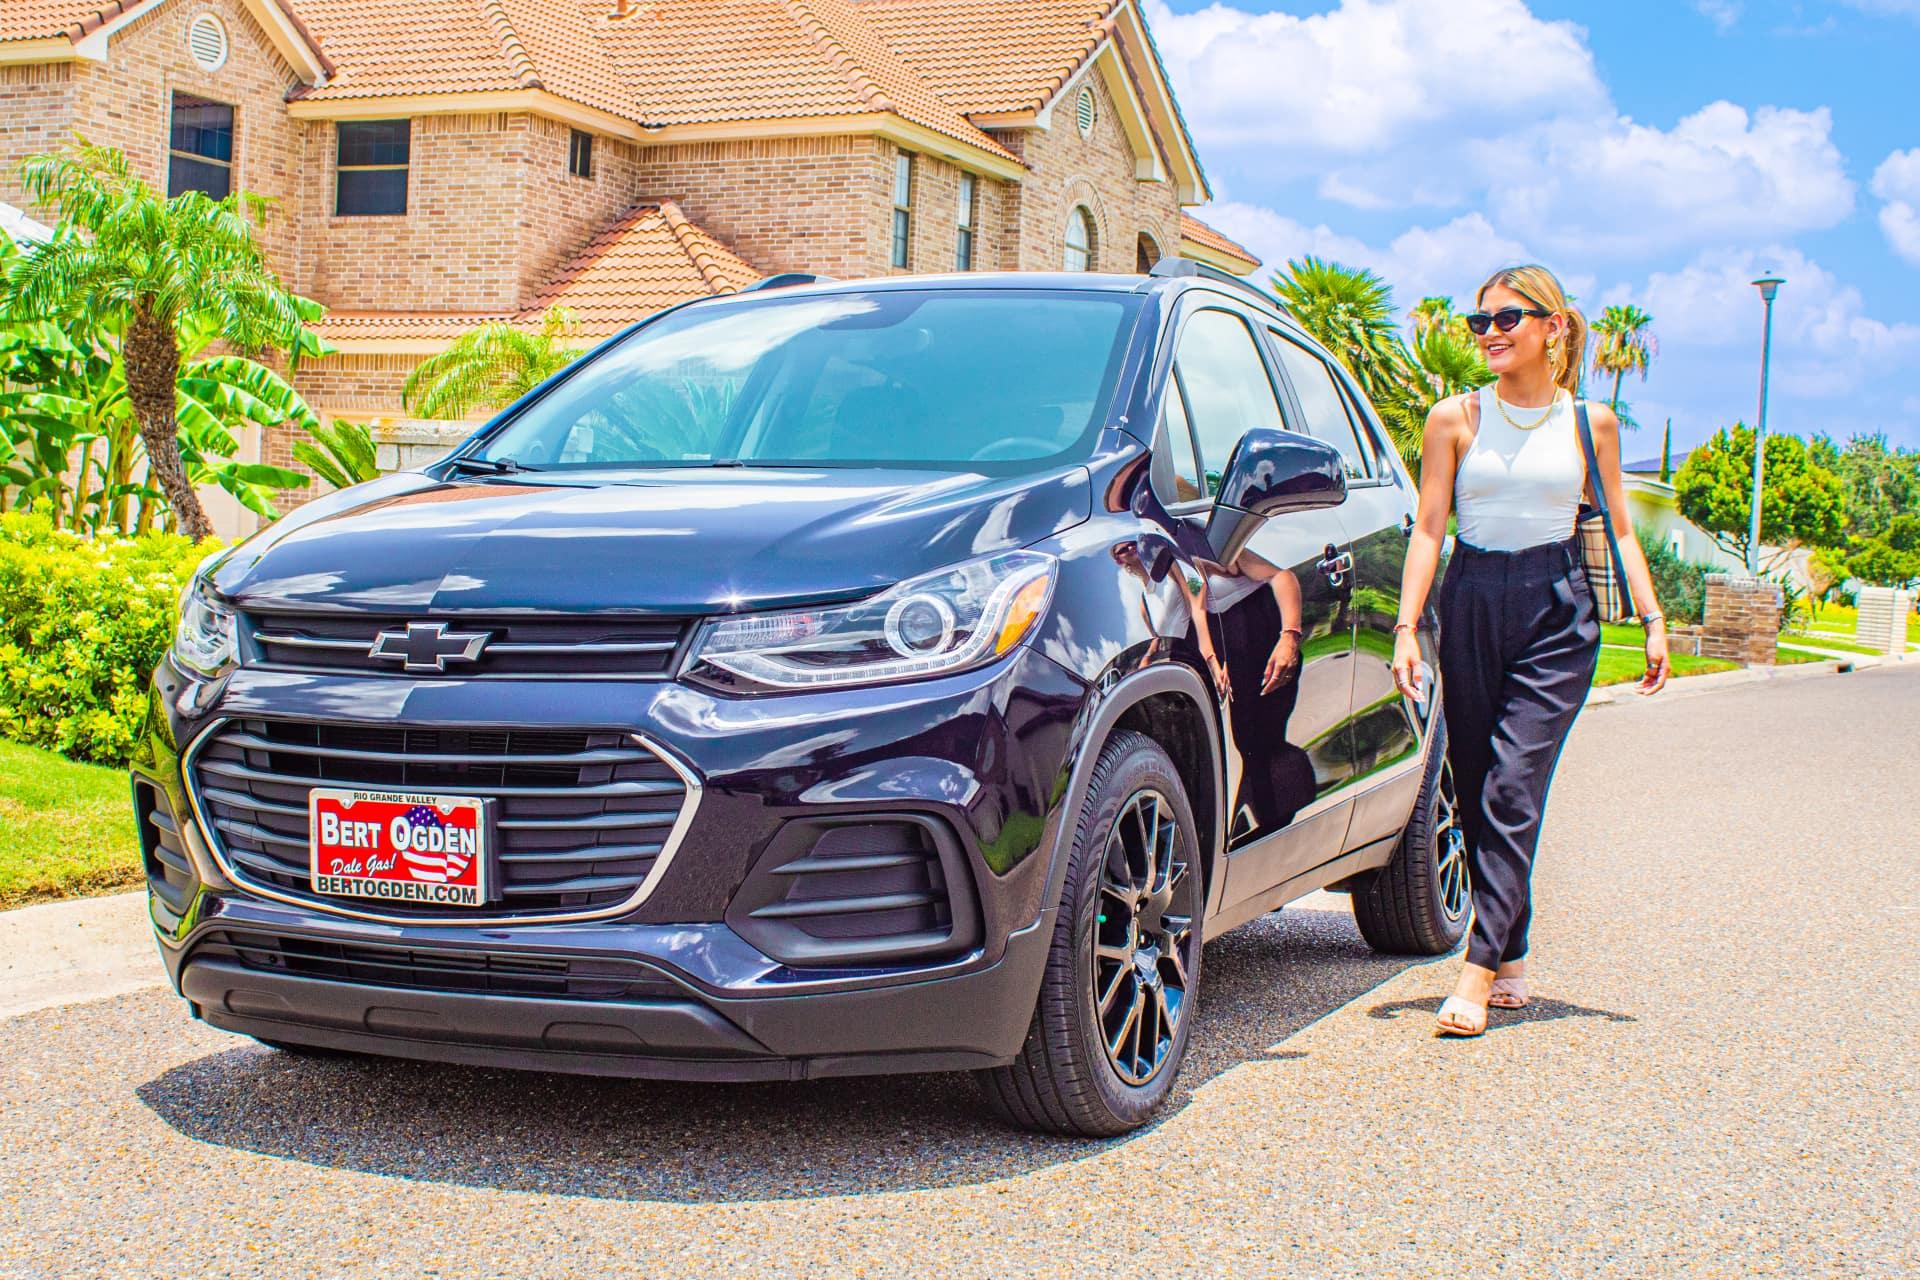 2021 Chevrolet Trax | Bert Ogden Chevrolet | Mission, TX